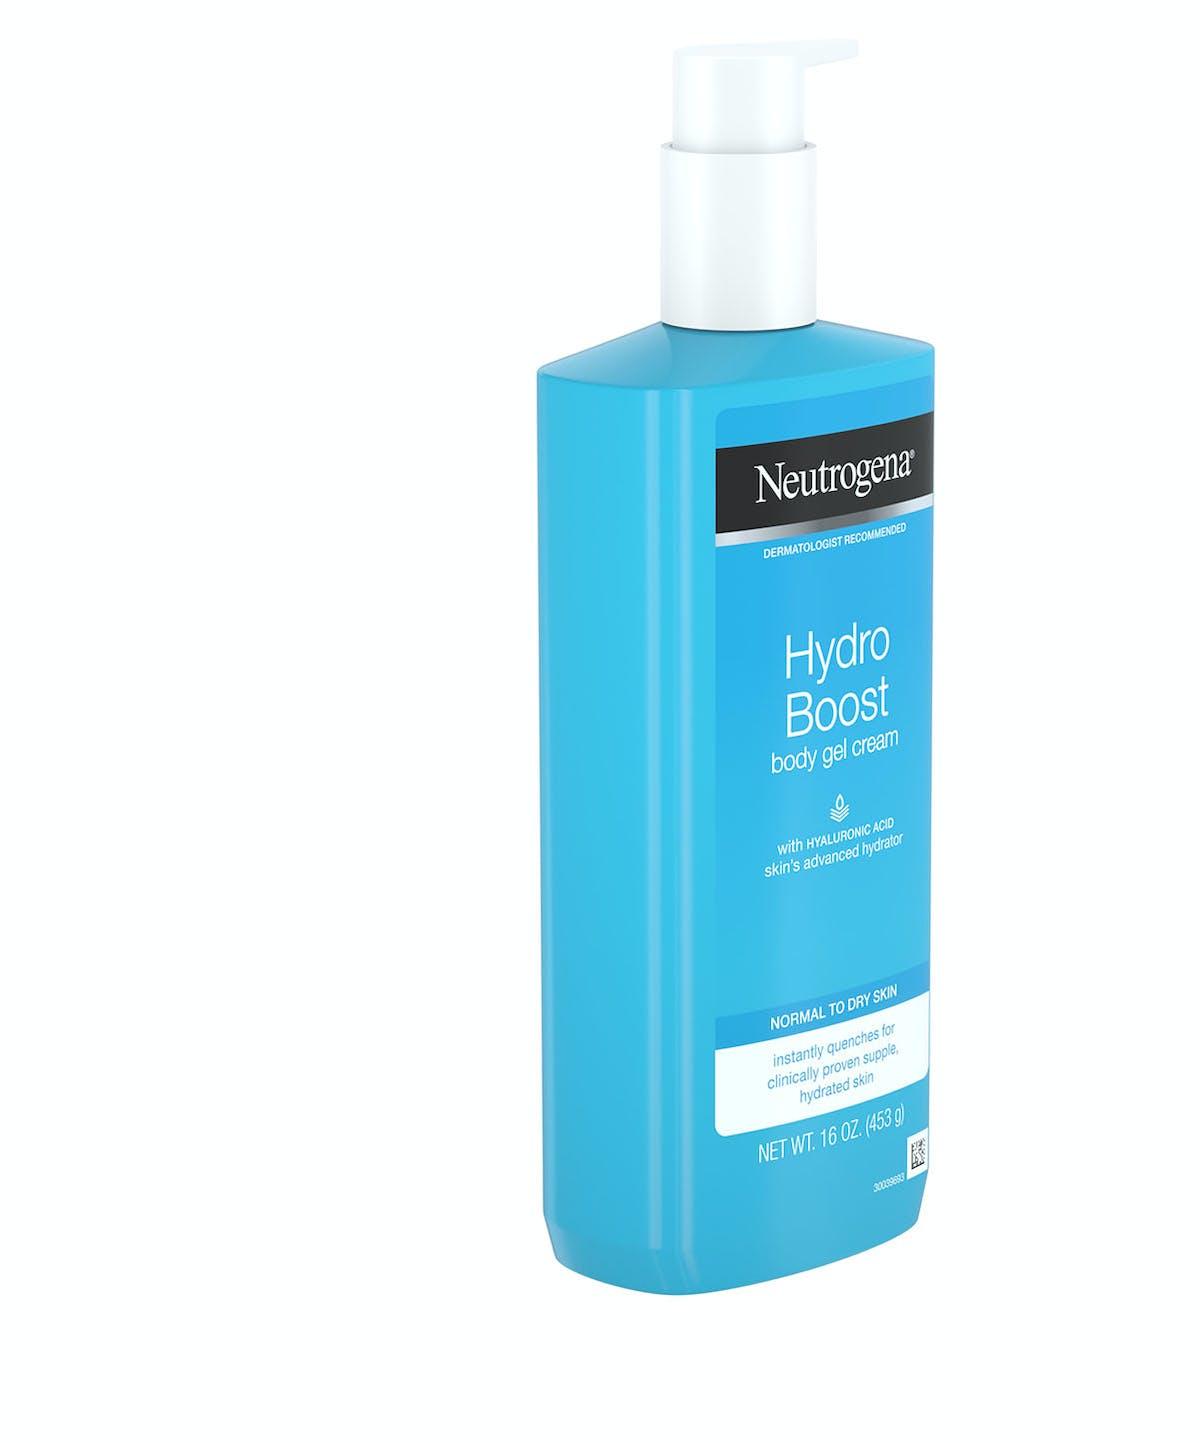 Neutrogena® Hydro Boost Body Gel Cream - Original Scent